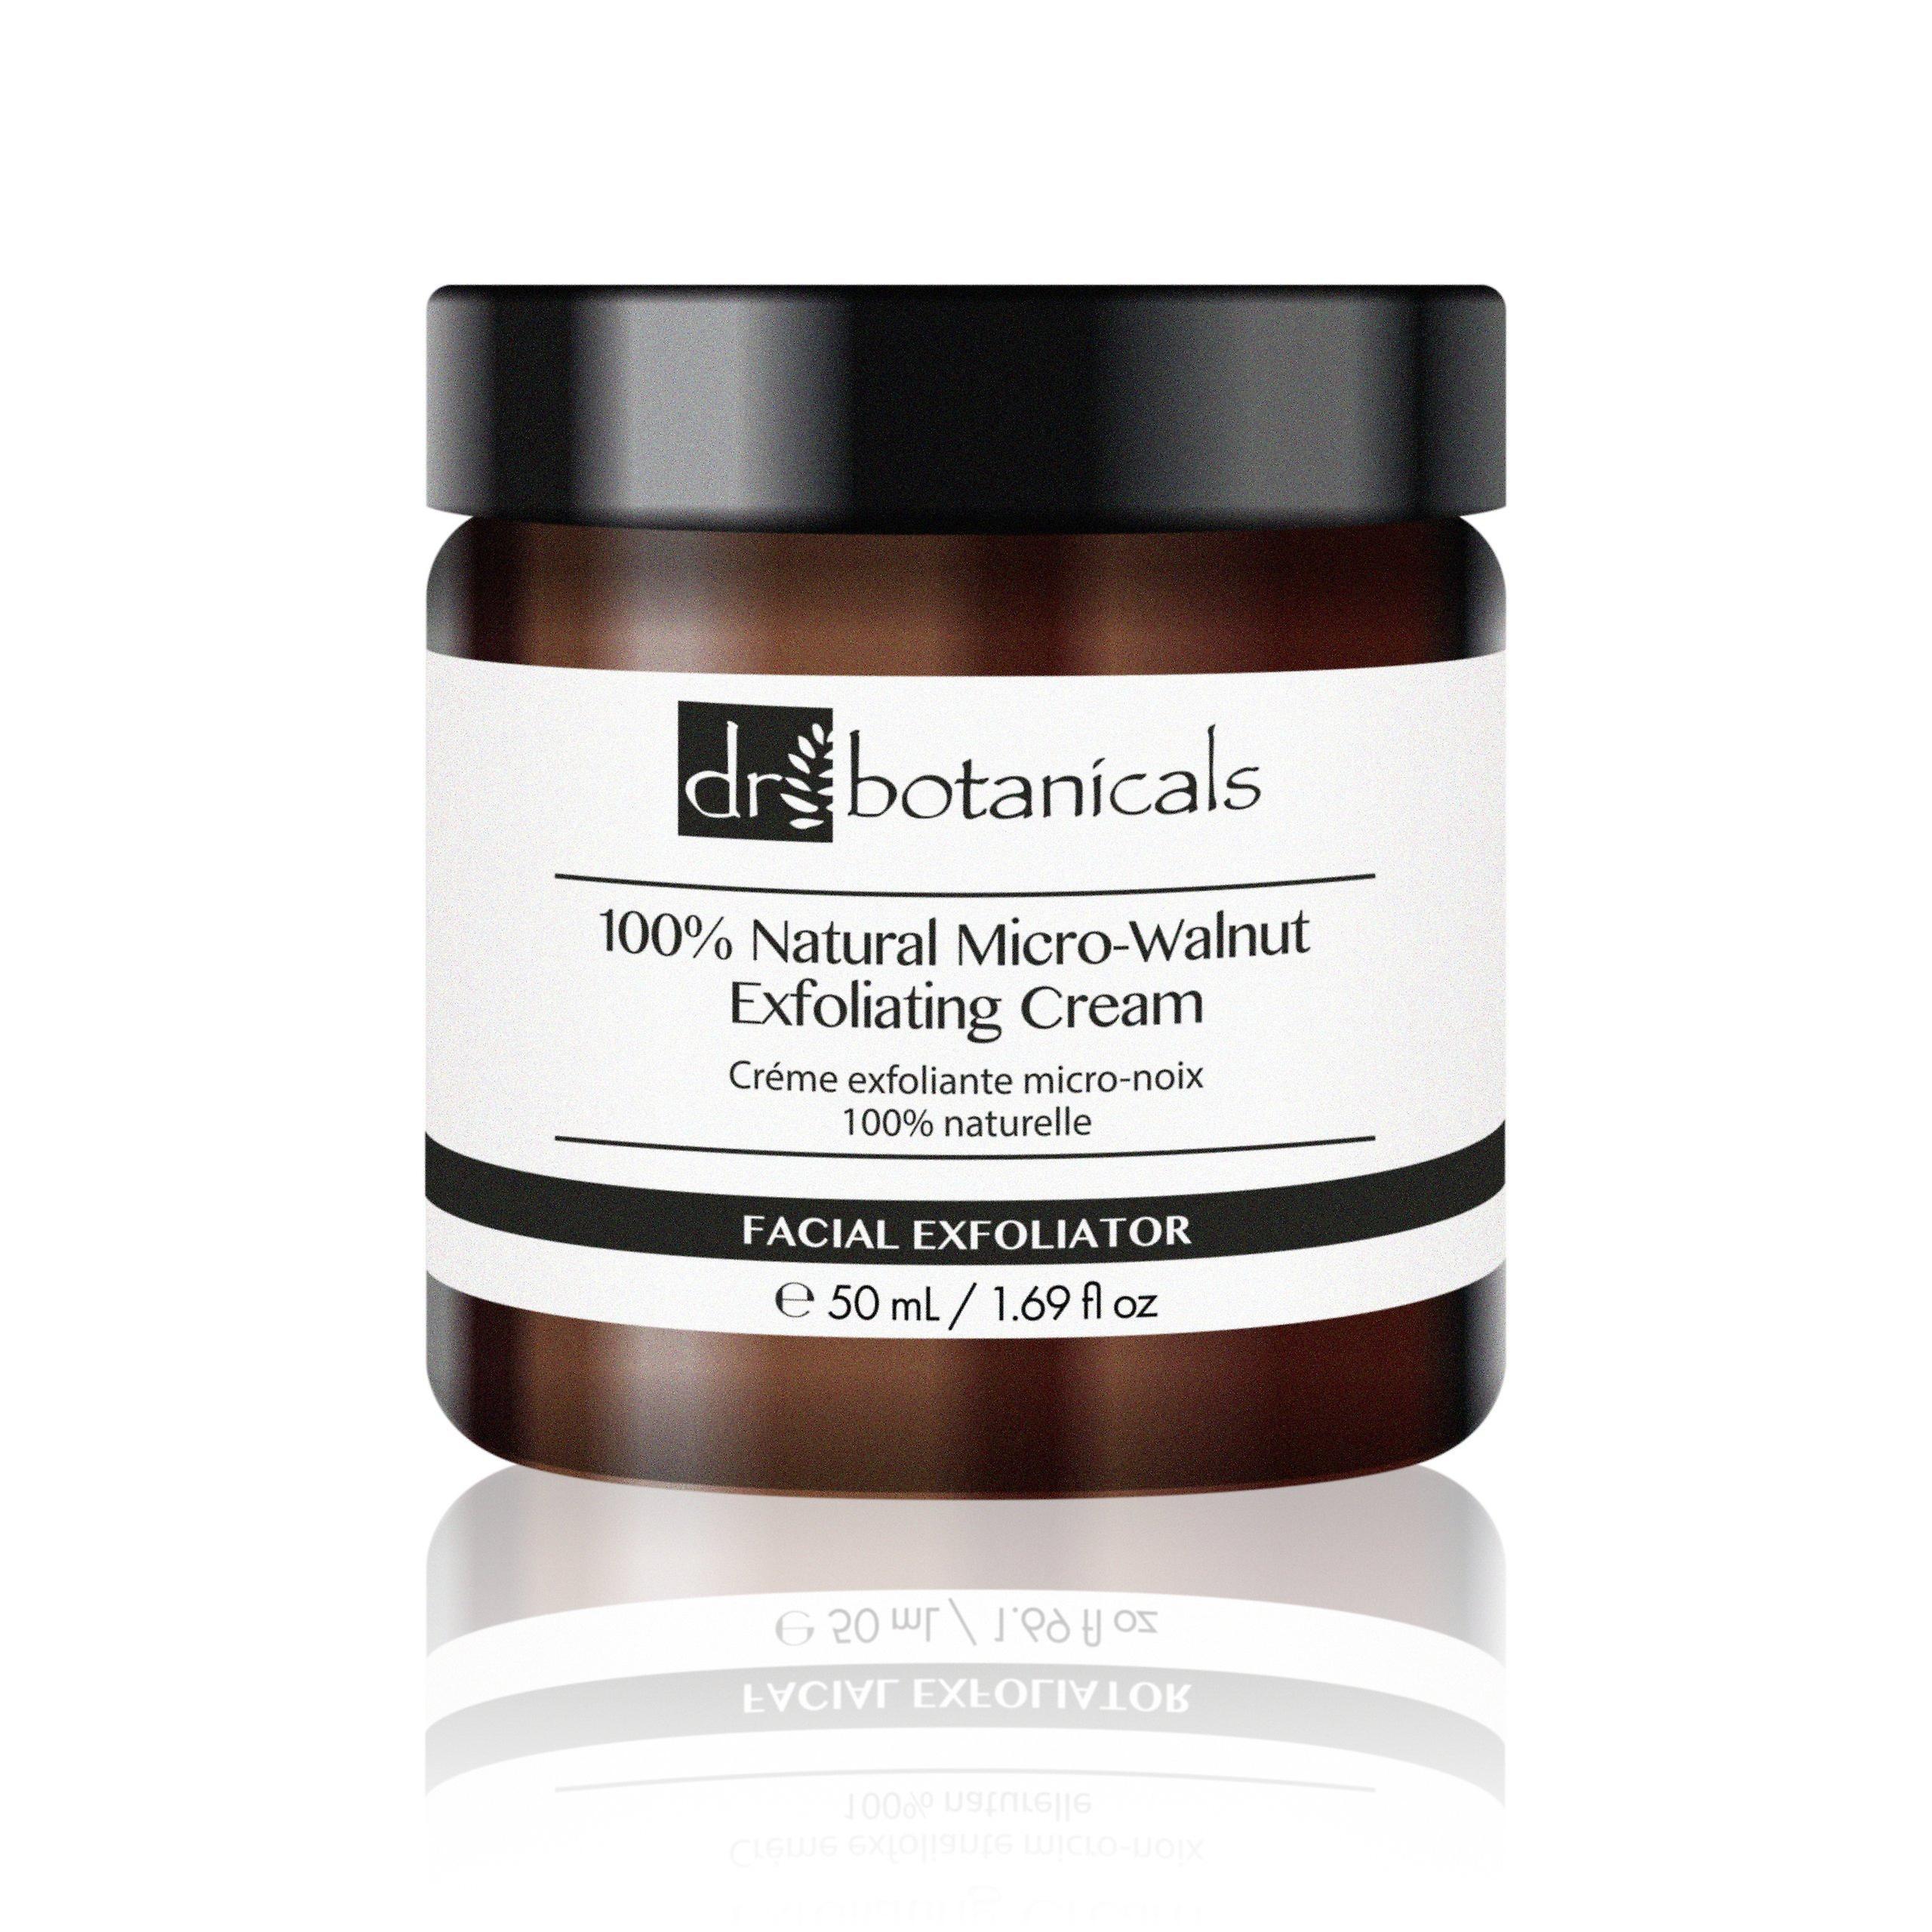 100% natural micro-walnut exfoliating cream